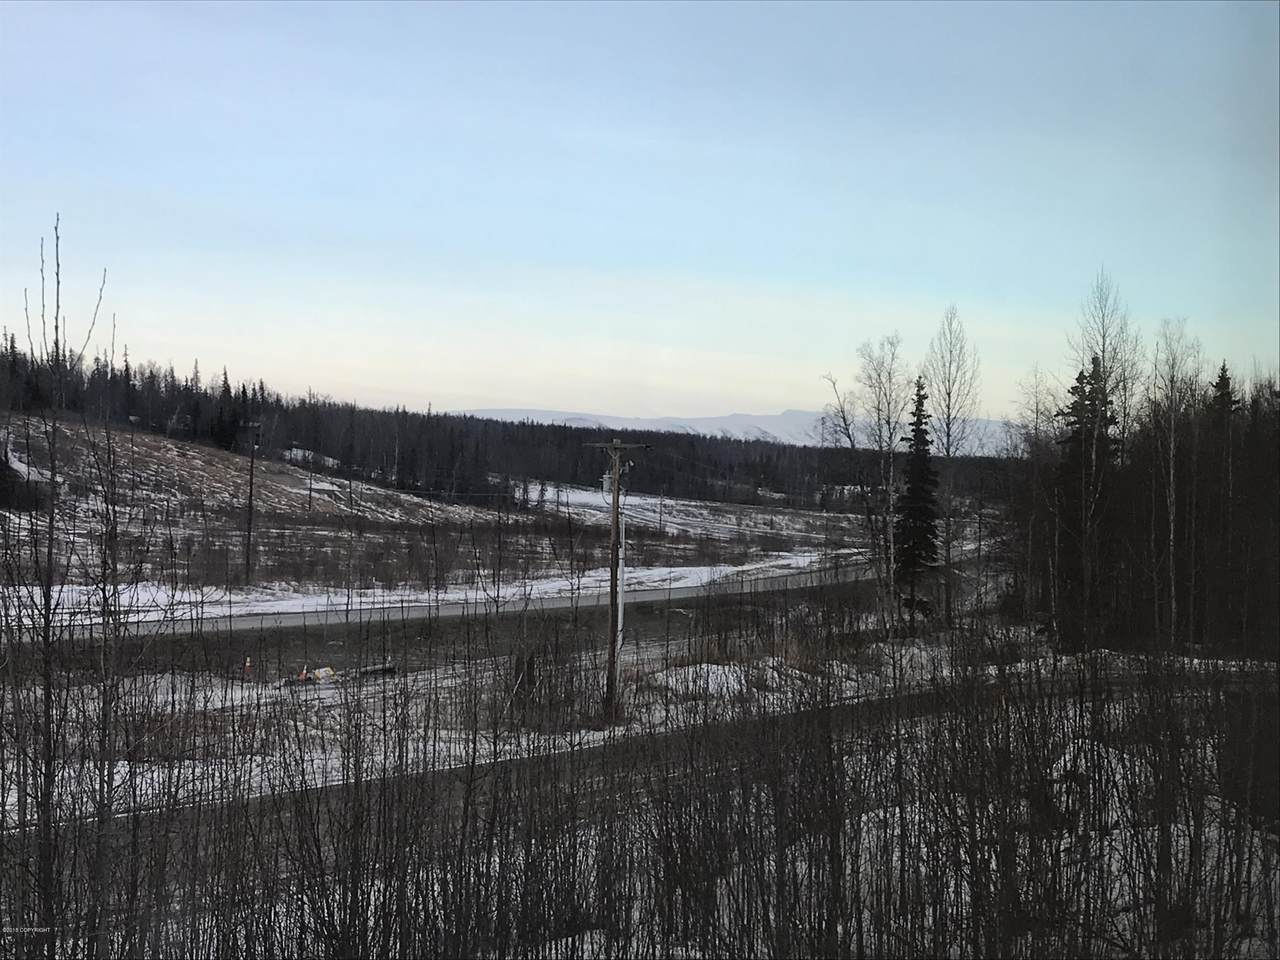 https://bt-photos.global.ssl.fastly.net/alaska/1280_boomver_1_20-10249-2.jpg